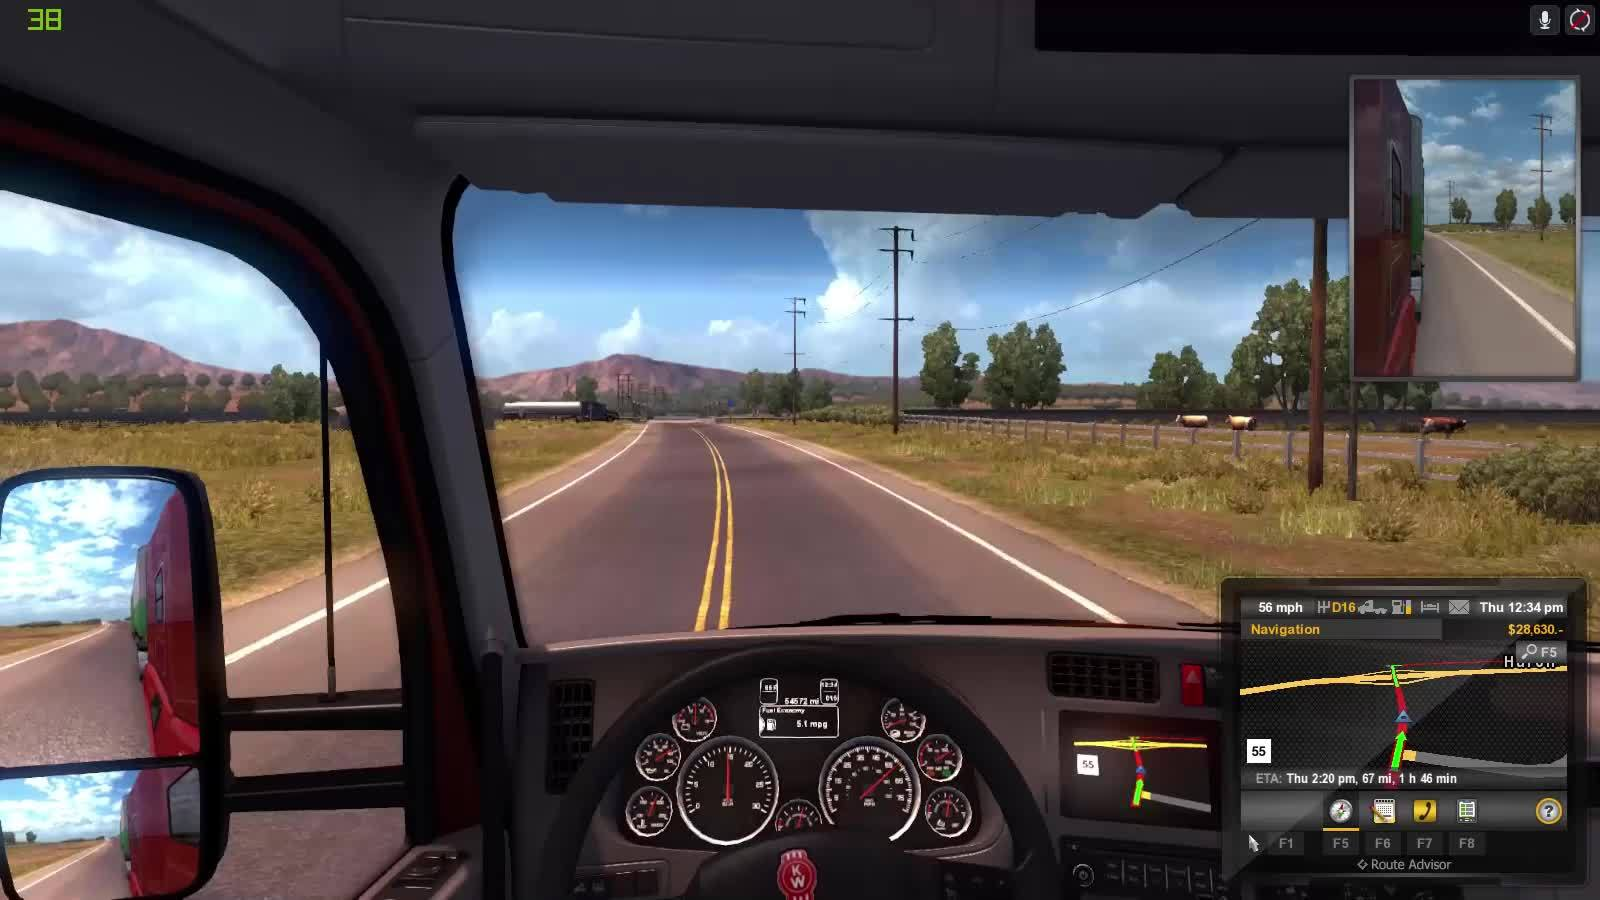 american truck sim, american truck simulator, trucksim, ATS stupid drivers. GIFs